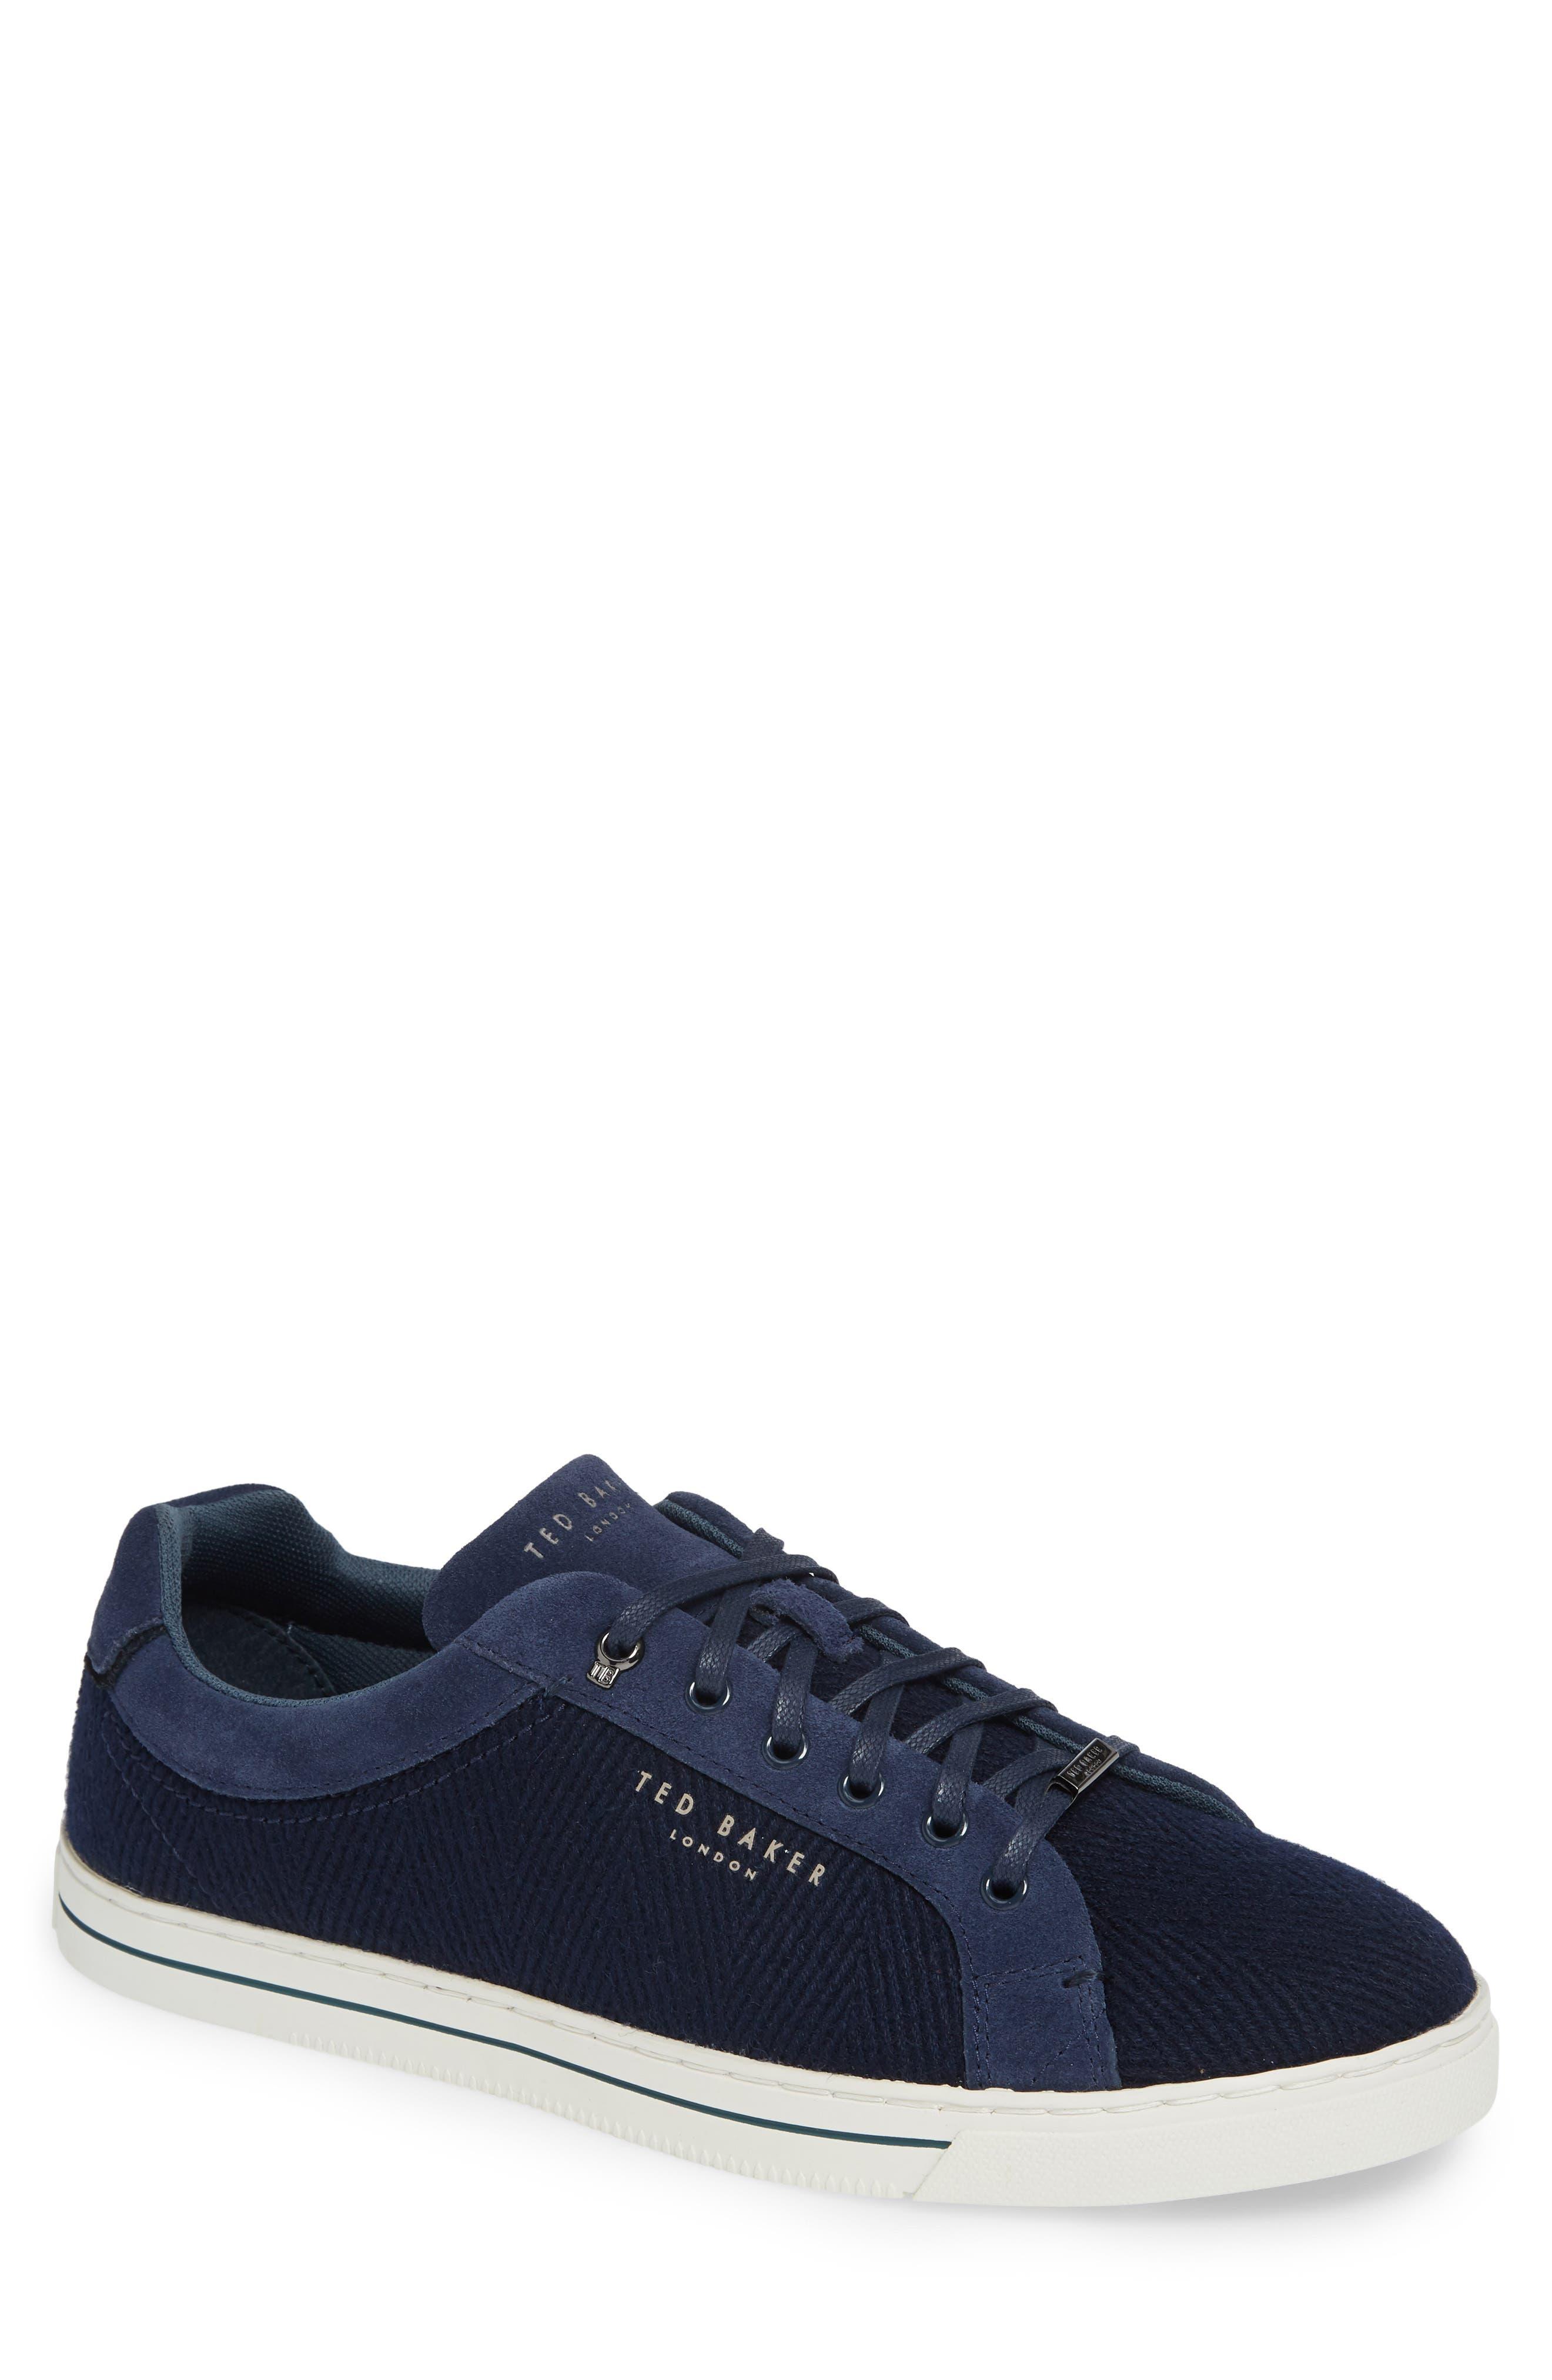 TED BAKER LONDON, Werill Sneaker, Main thumbnail 1, color, DARK BLUE WOOL